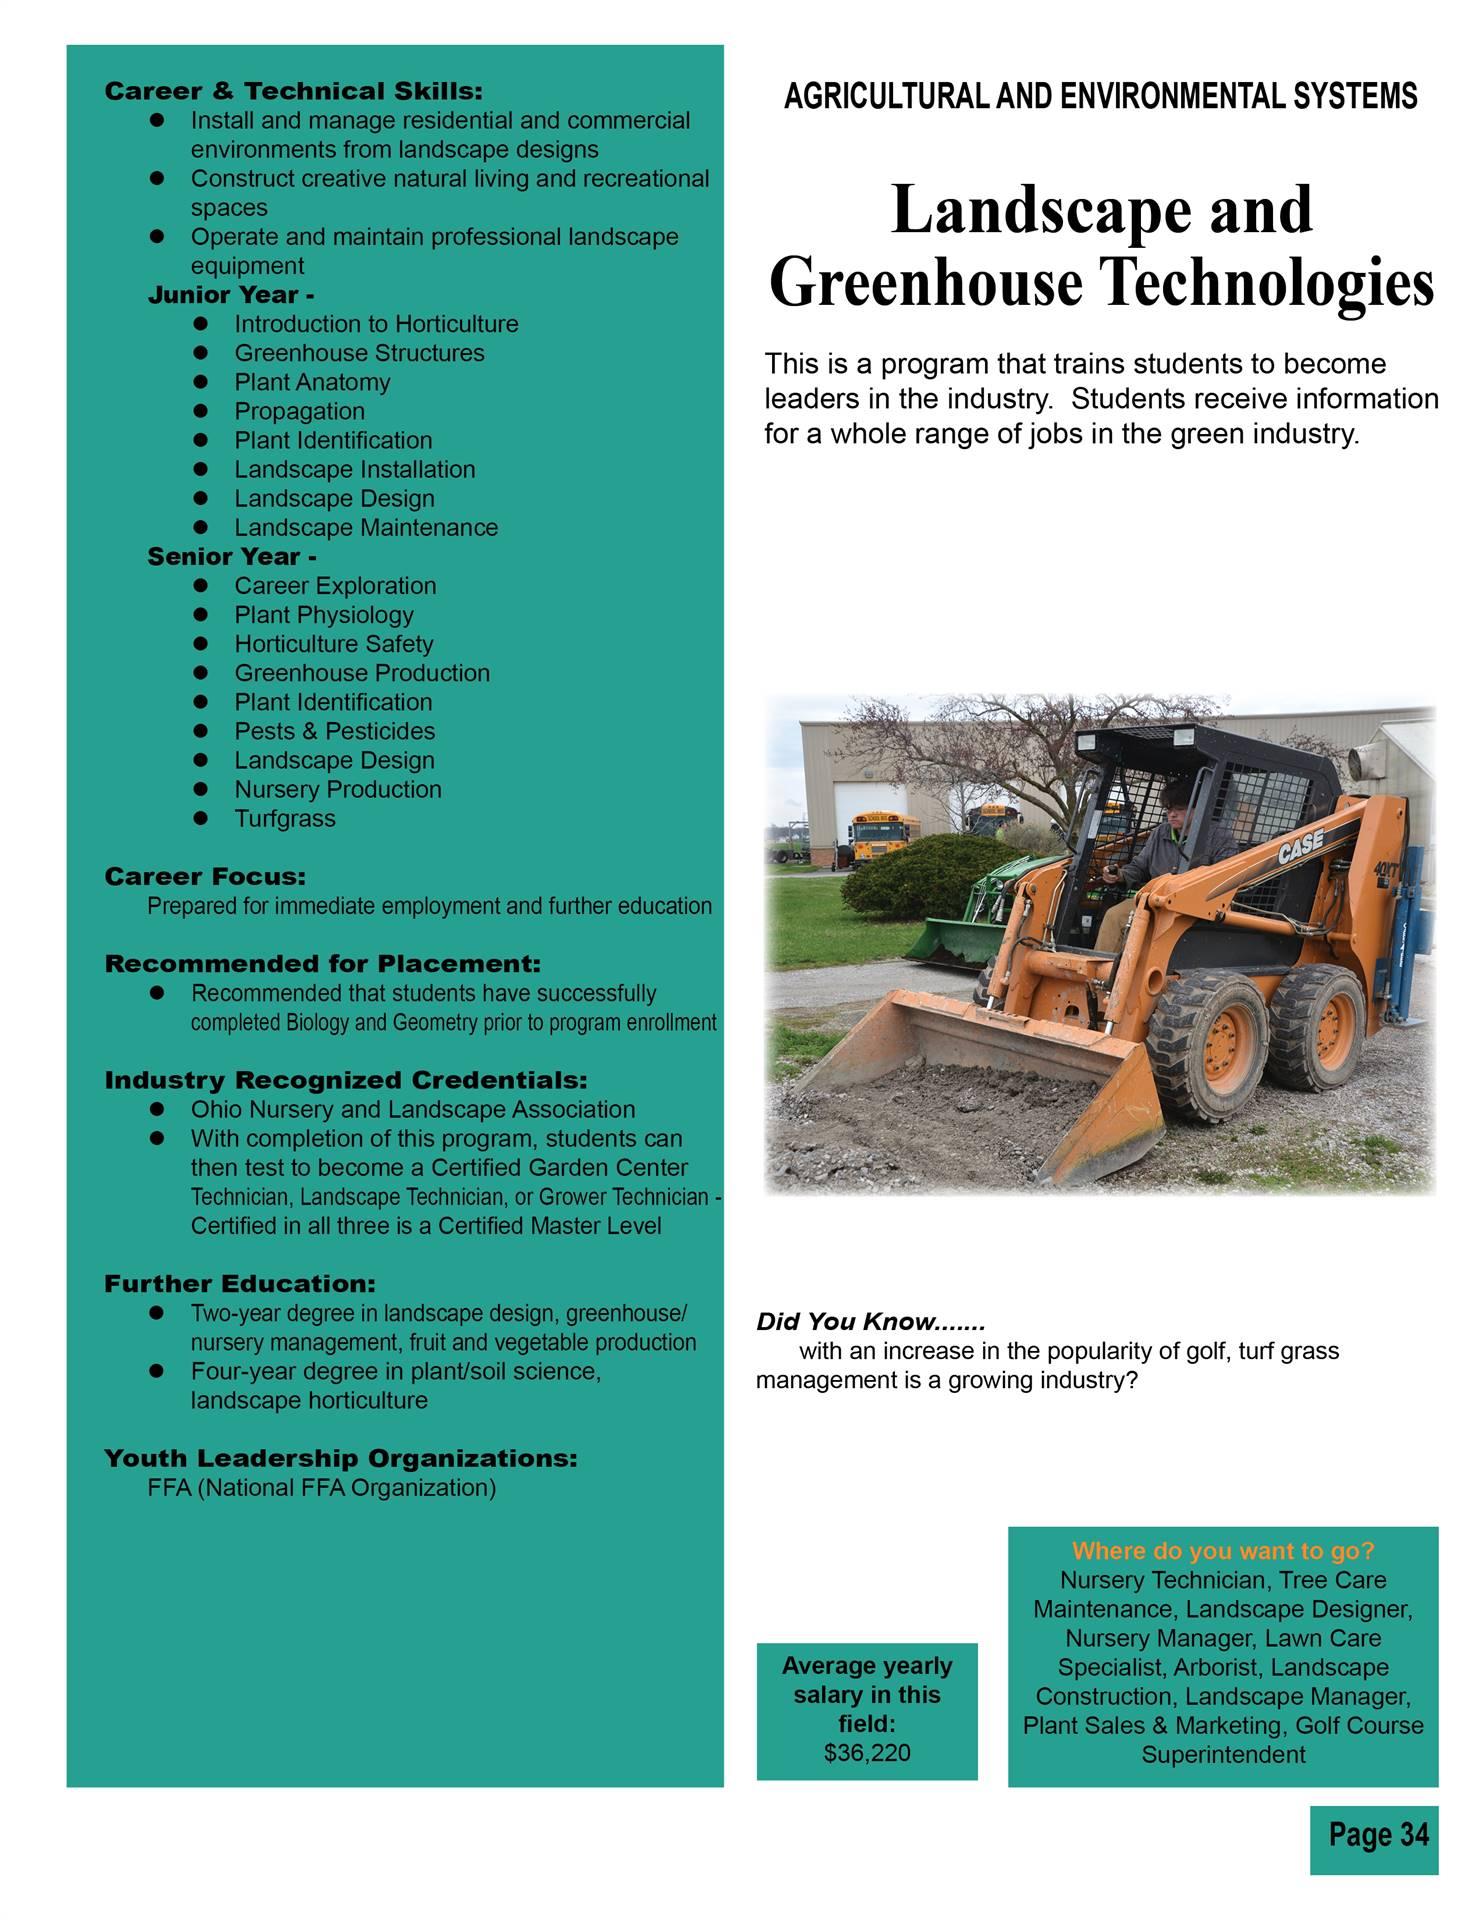 Landscape & Greenhouse Technologies